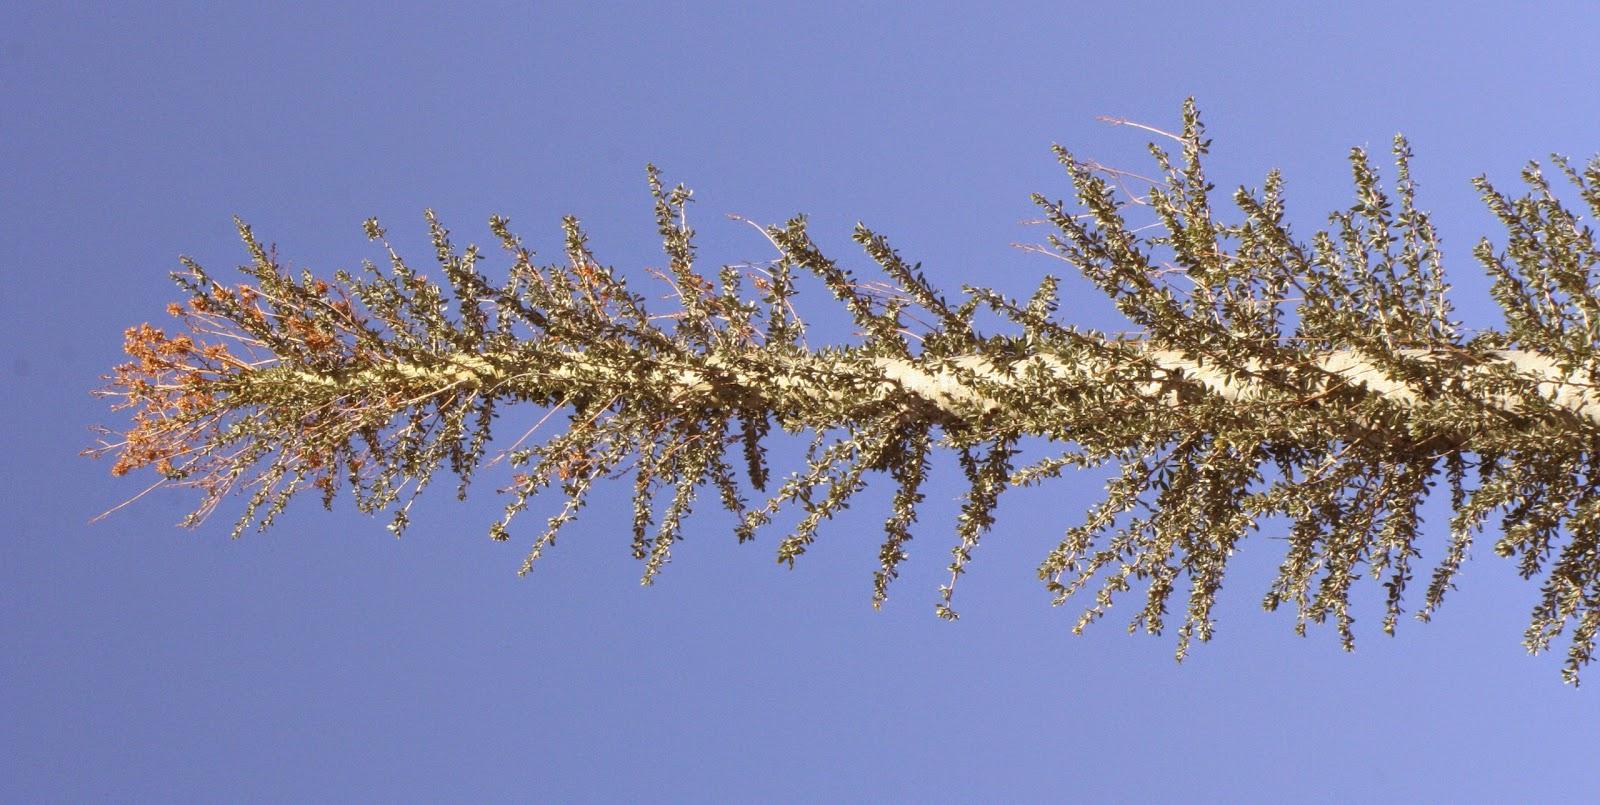 Jenis-Jenis Pohon Unik dan Terkenal di Dunia